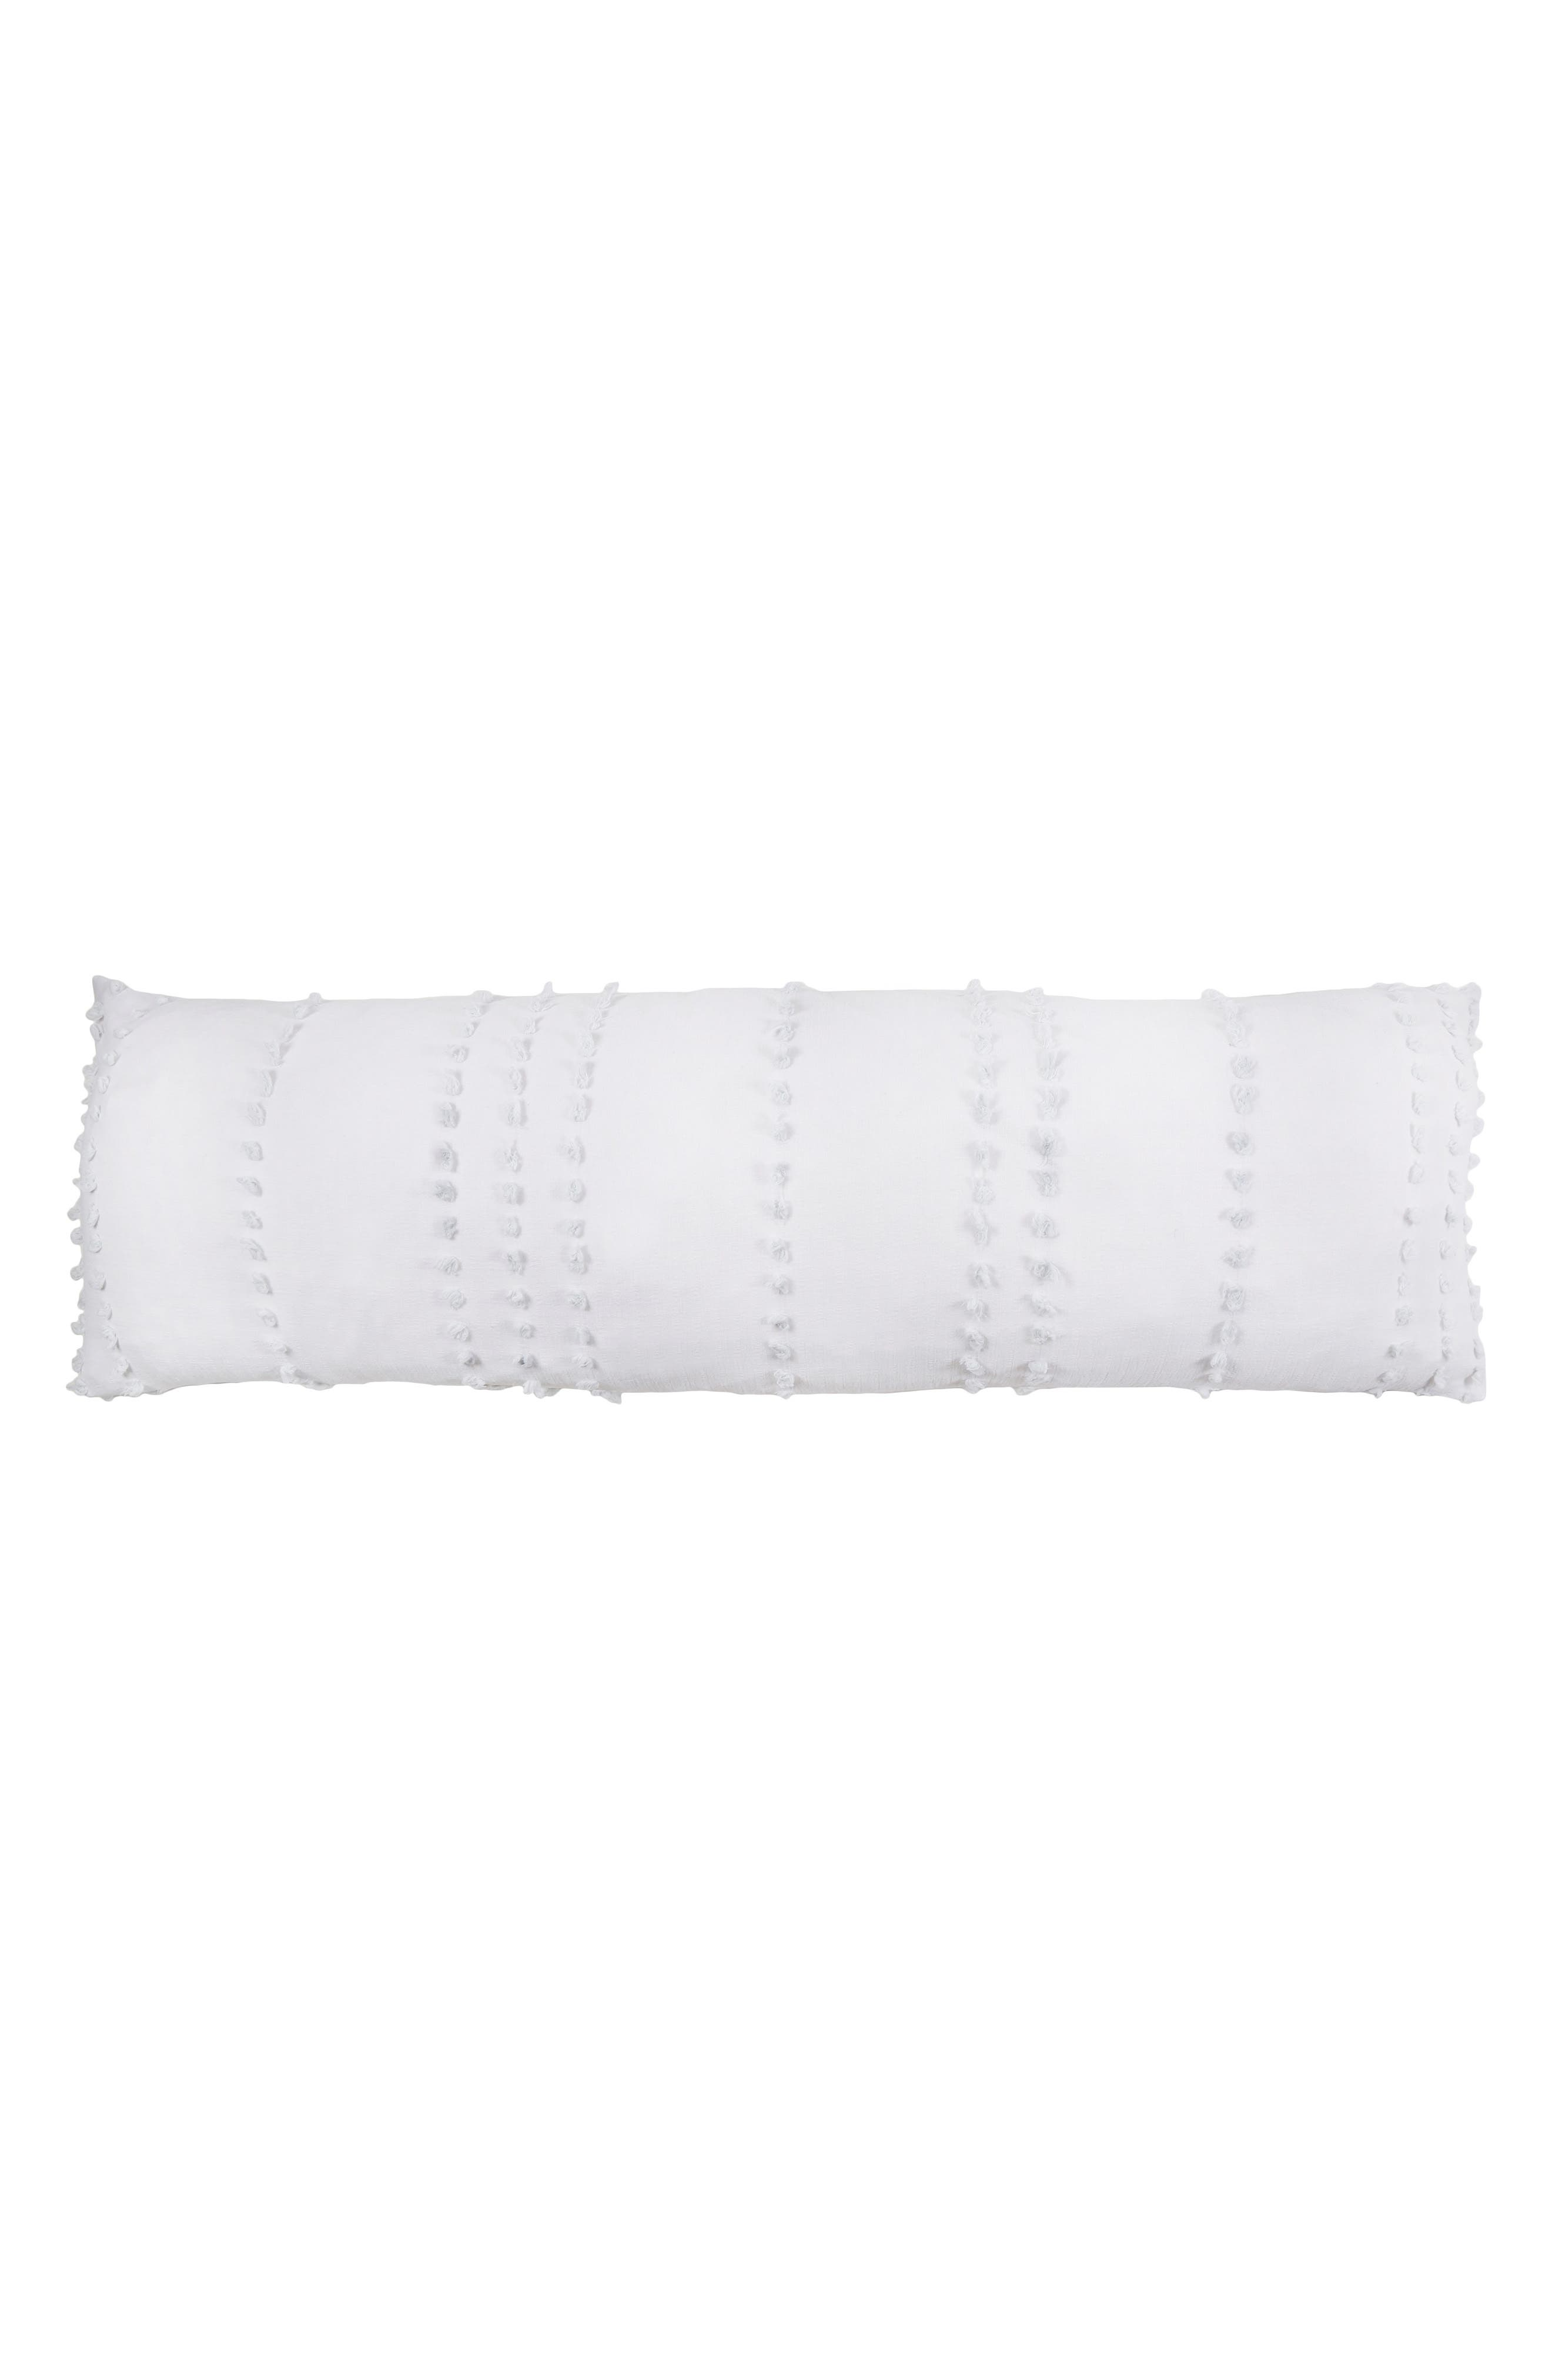 Poppy Body Pillow,                             Main thumbnail 1, color,                             White/ Barely Blue